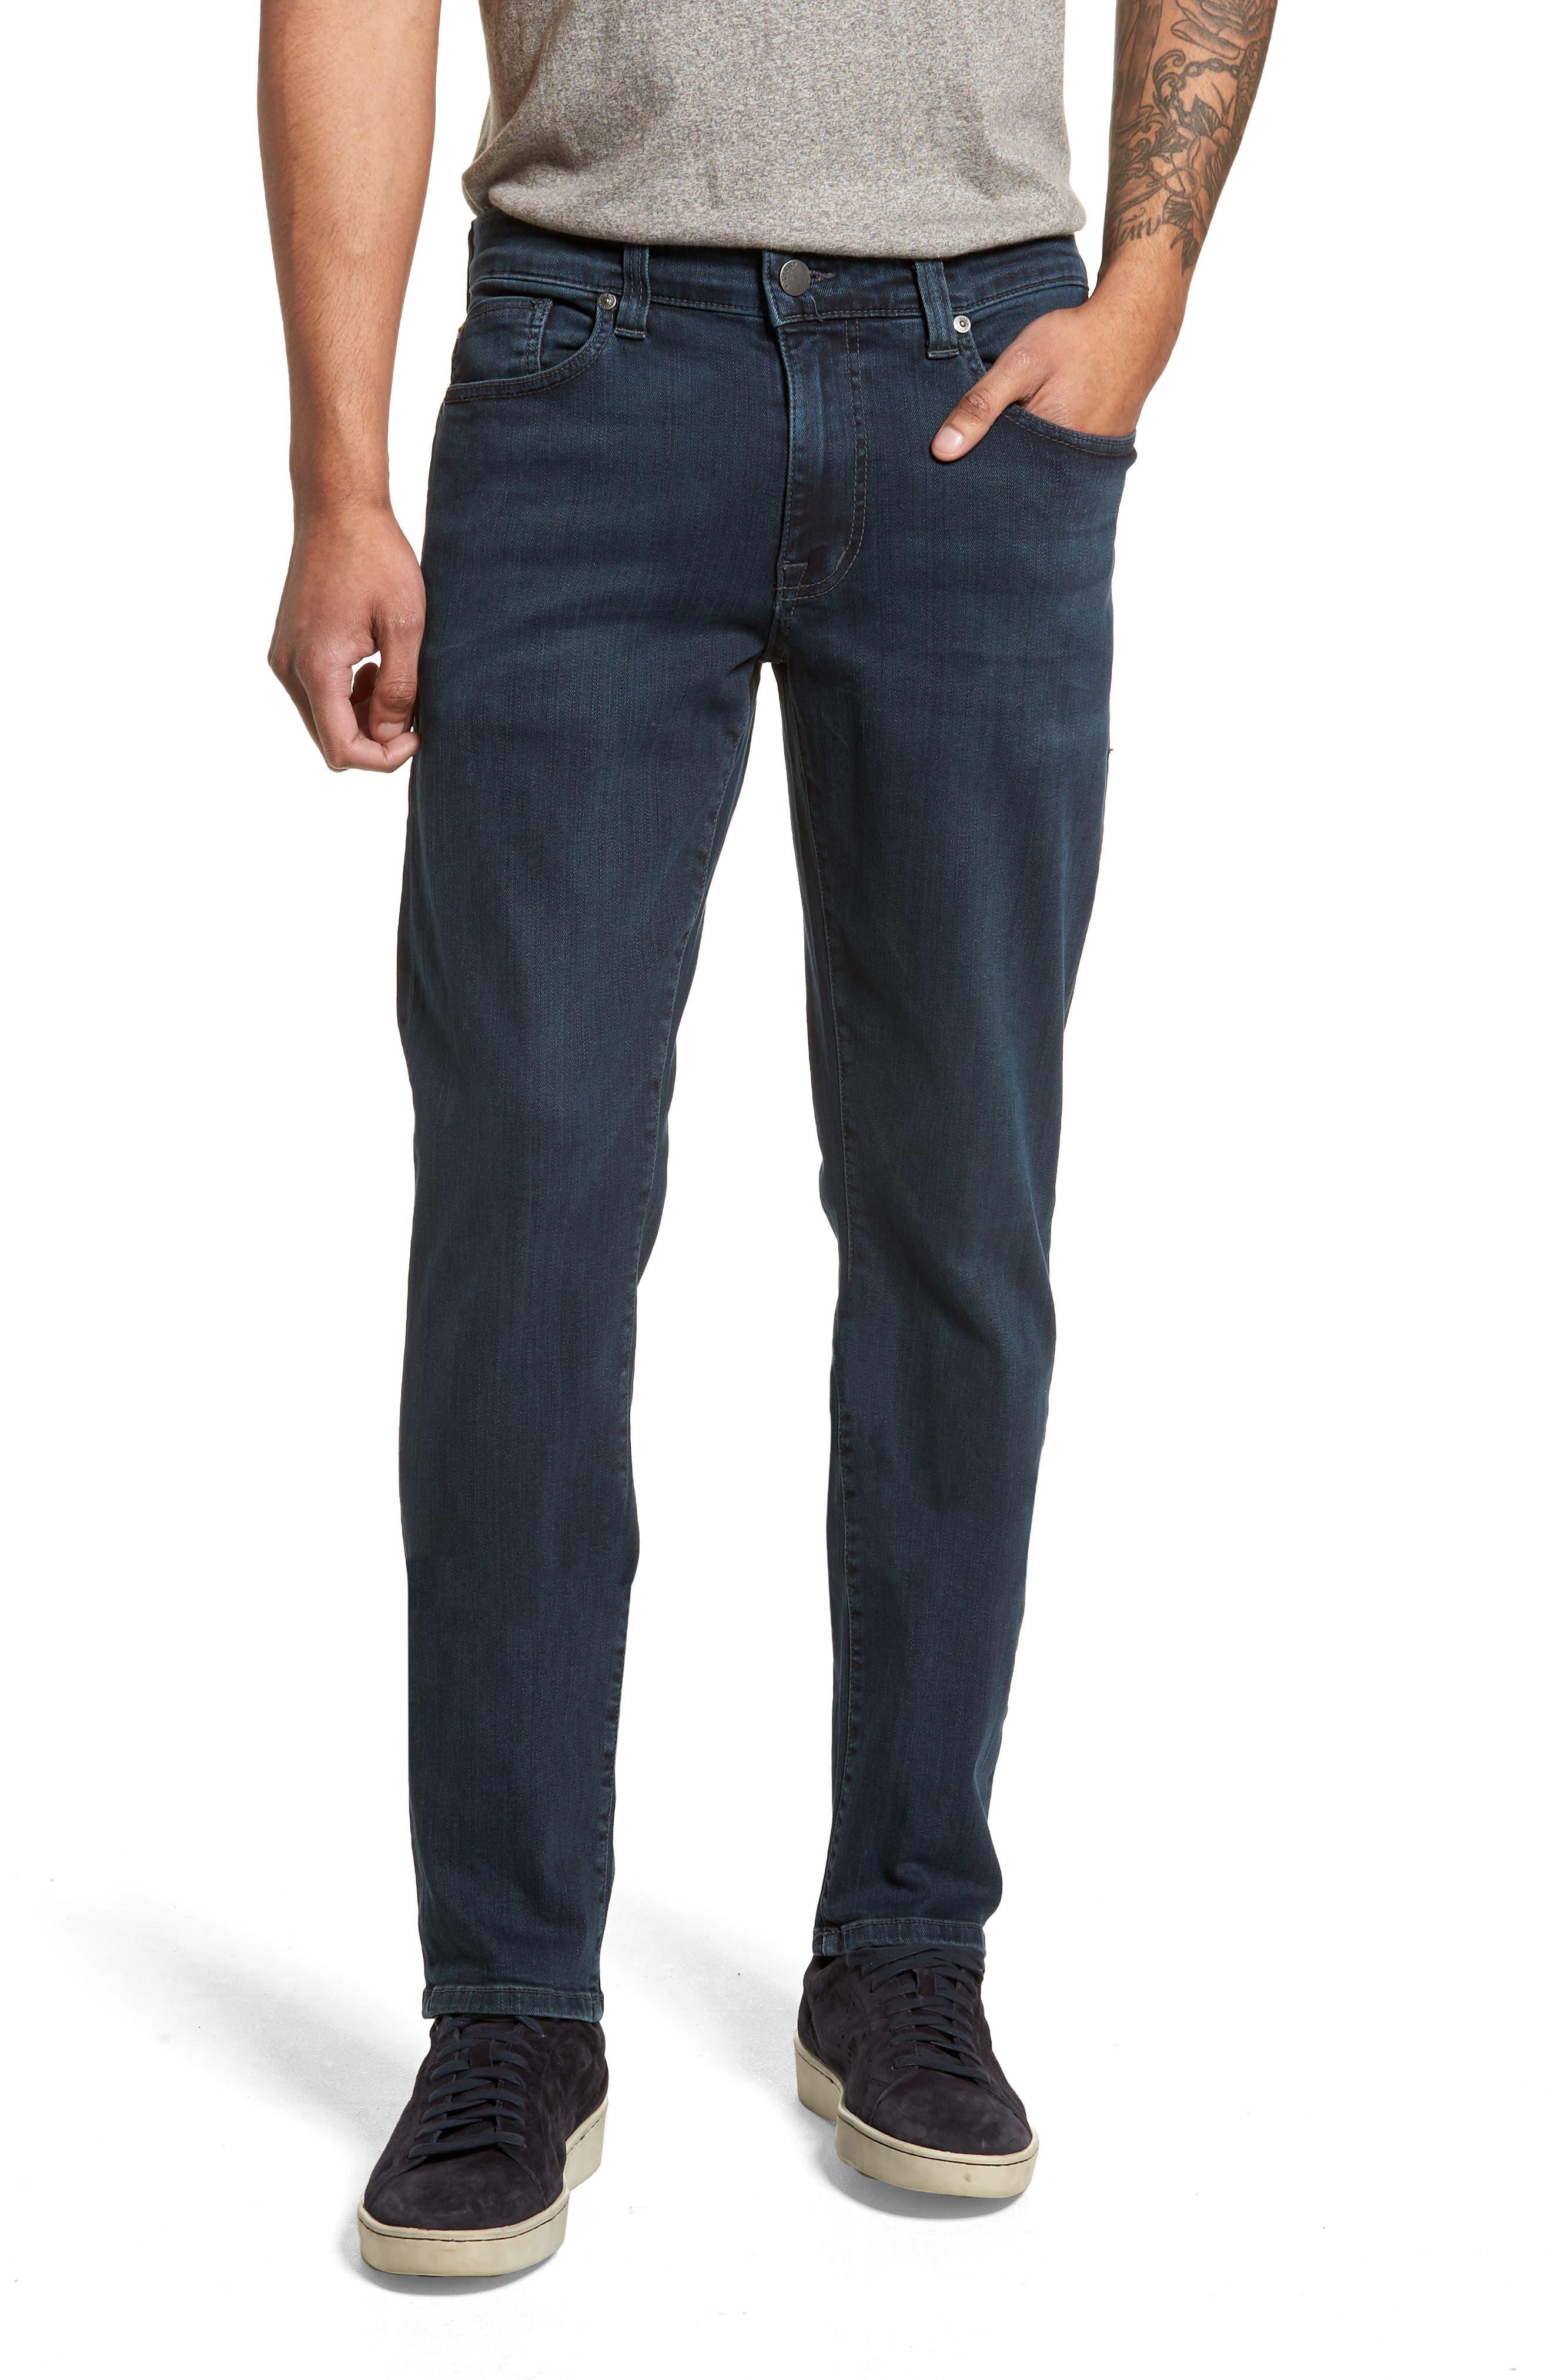 Fidelity Denim Torino Slim Fit Jeans (Manchester)